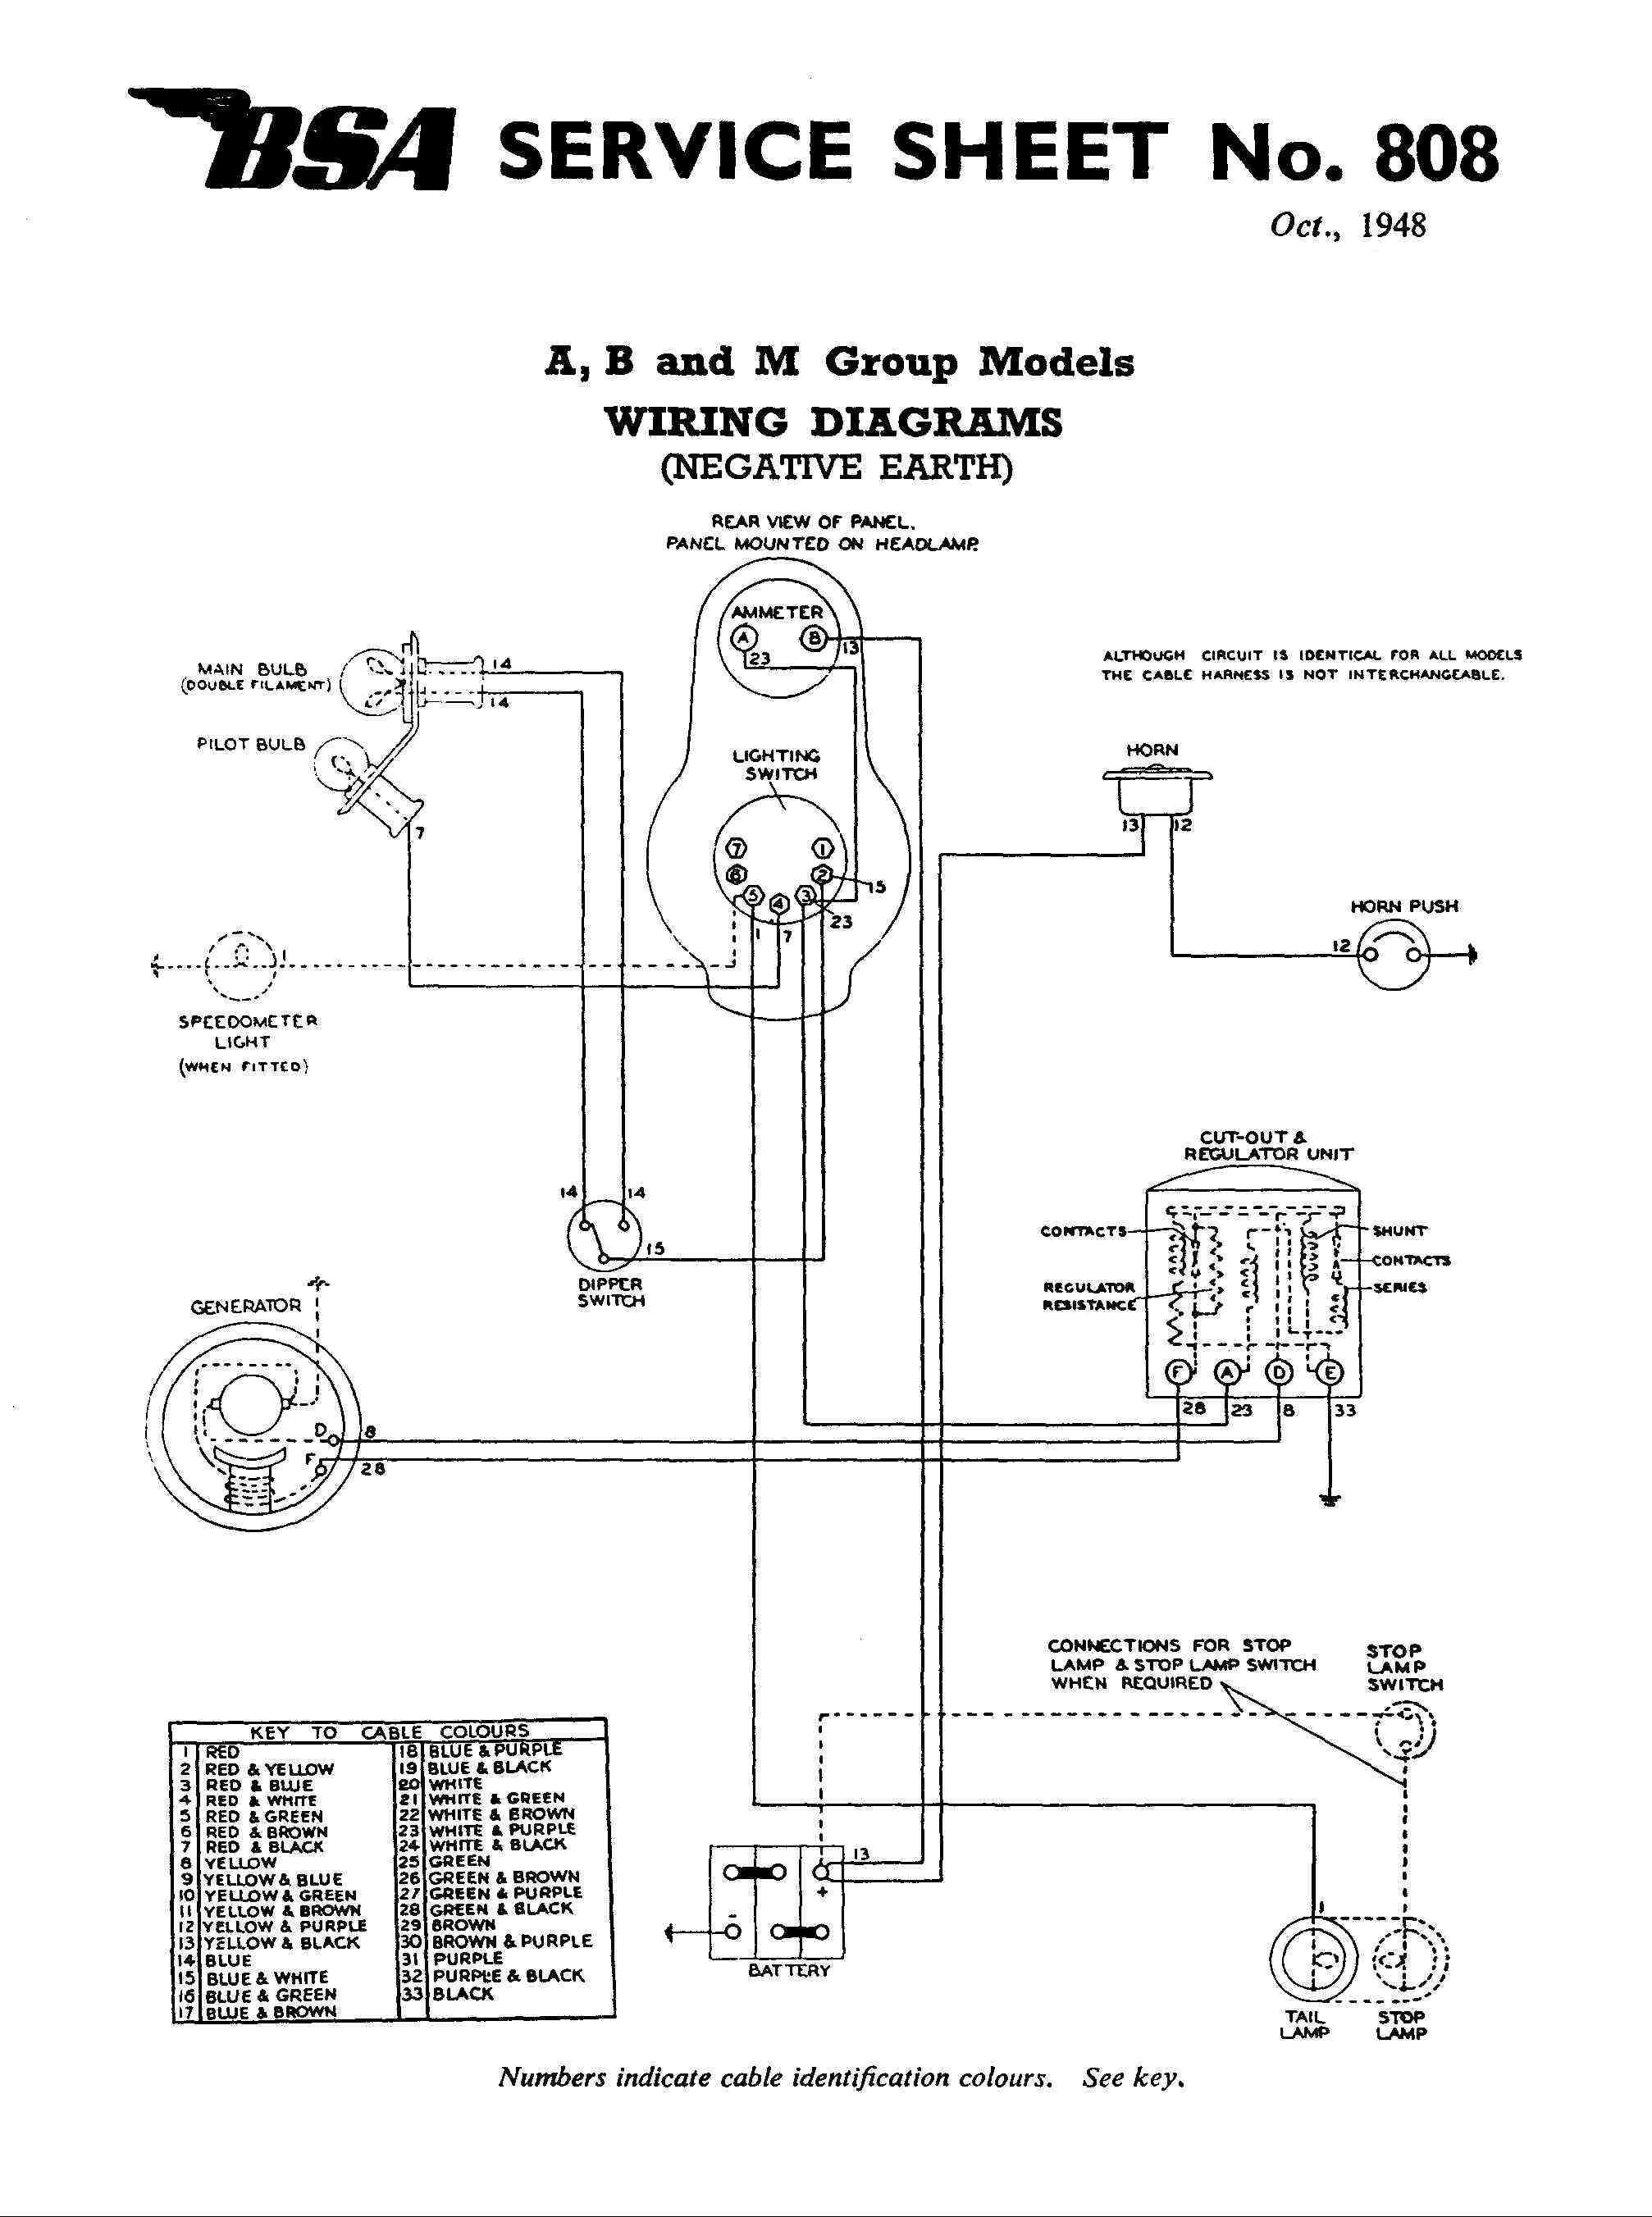 Wiring Diagram Shunt Wiring Harness Wiring Diagram Wiring